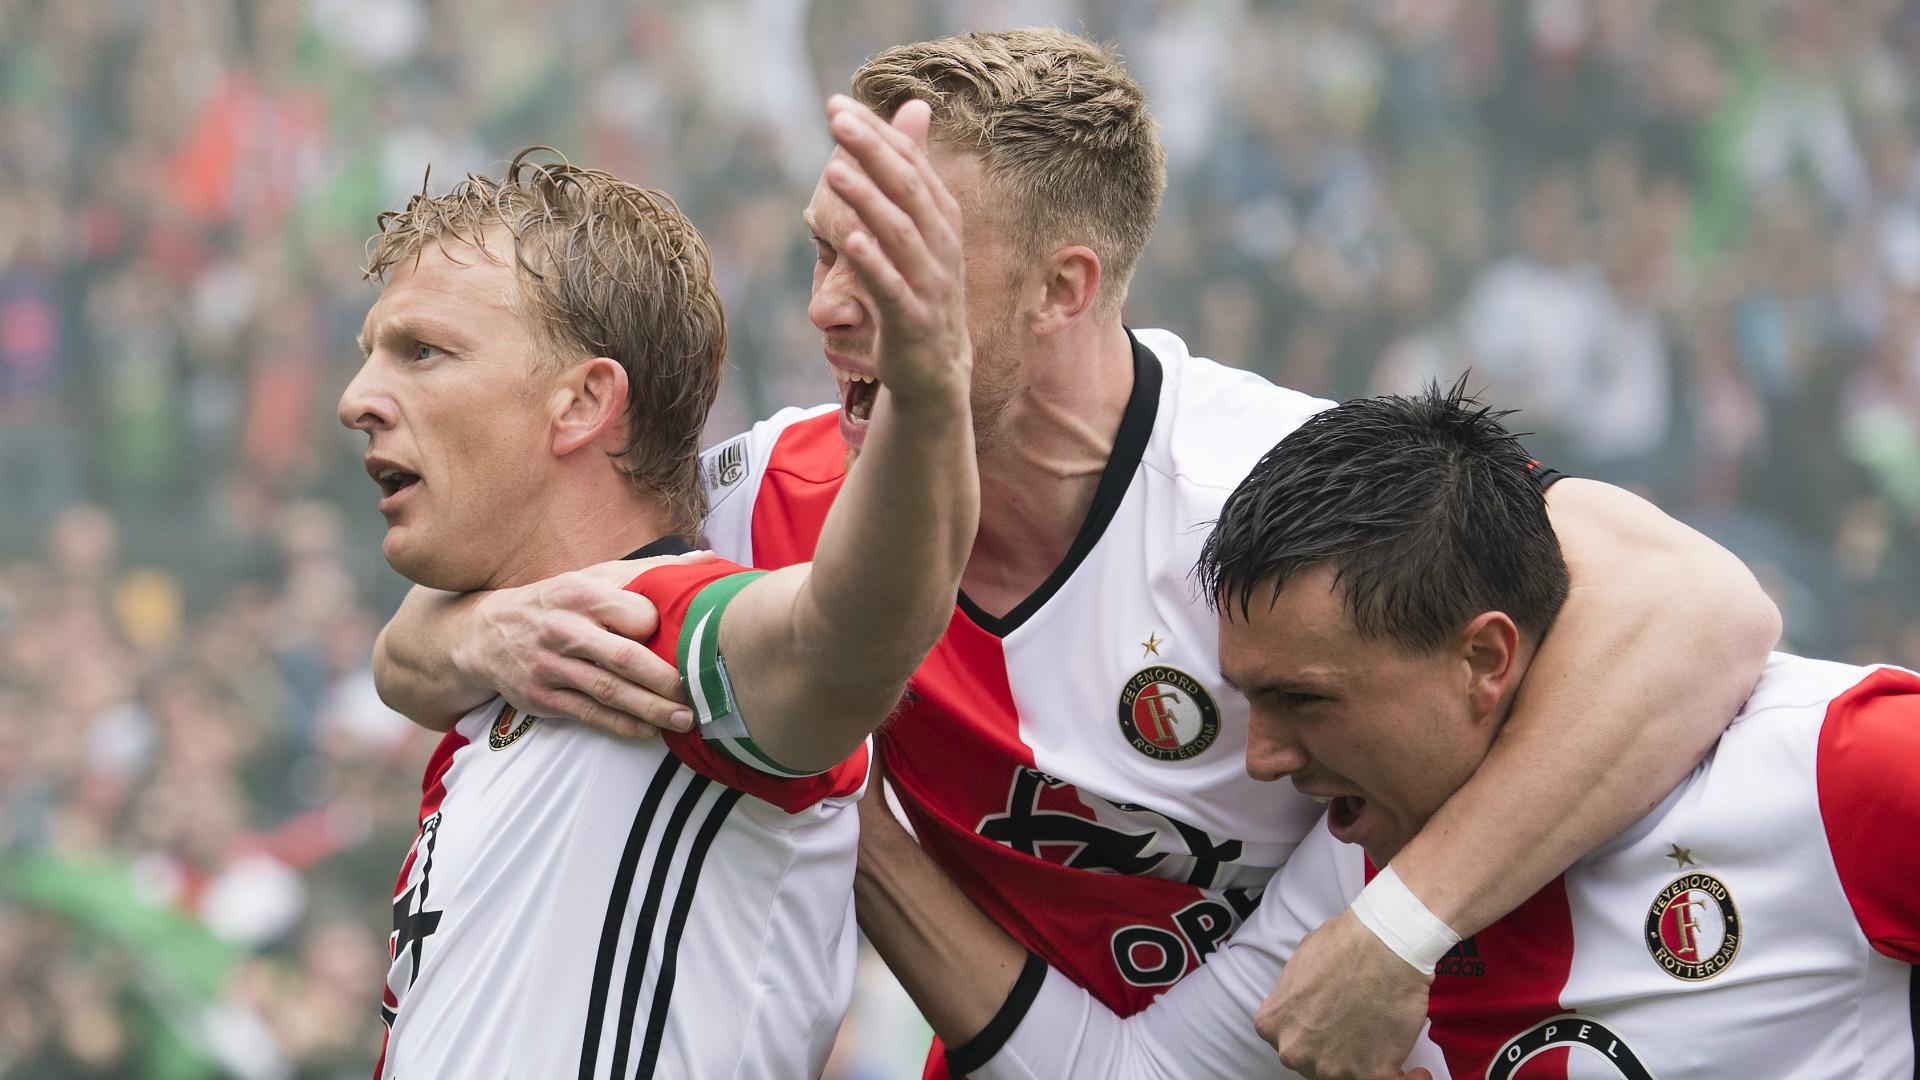 Le titre pour Feyenoord — Pays-Bas